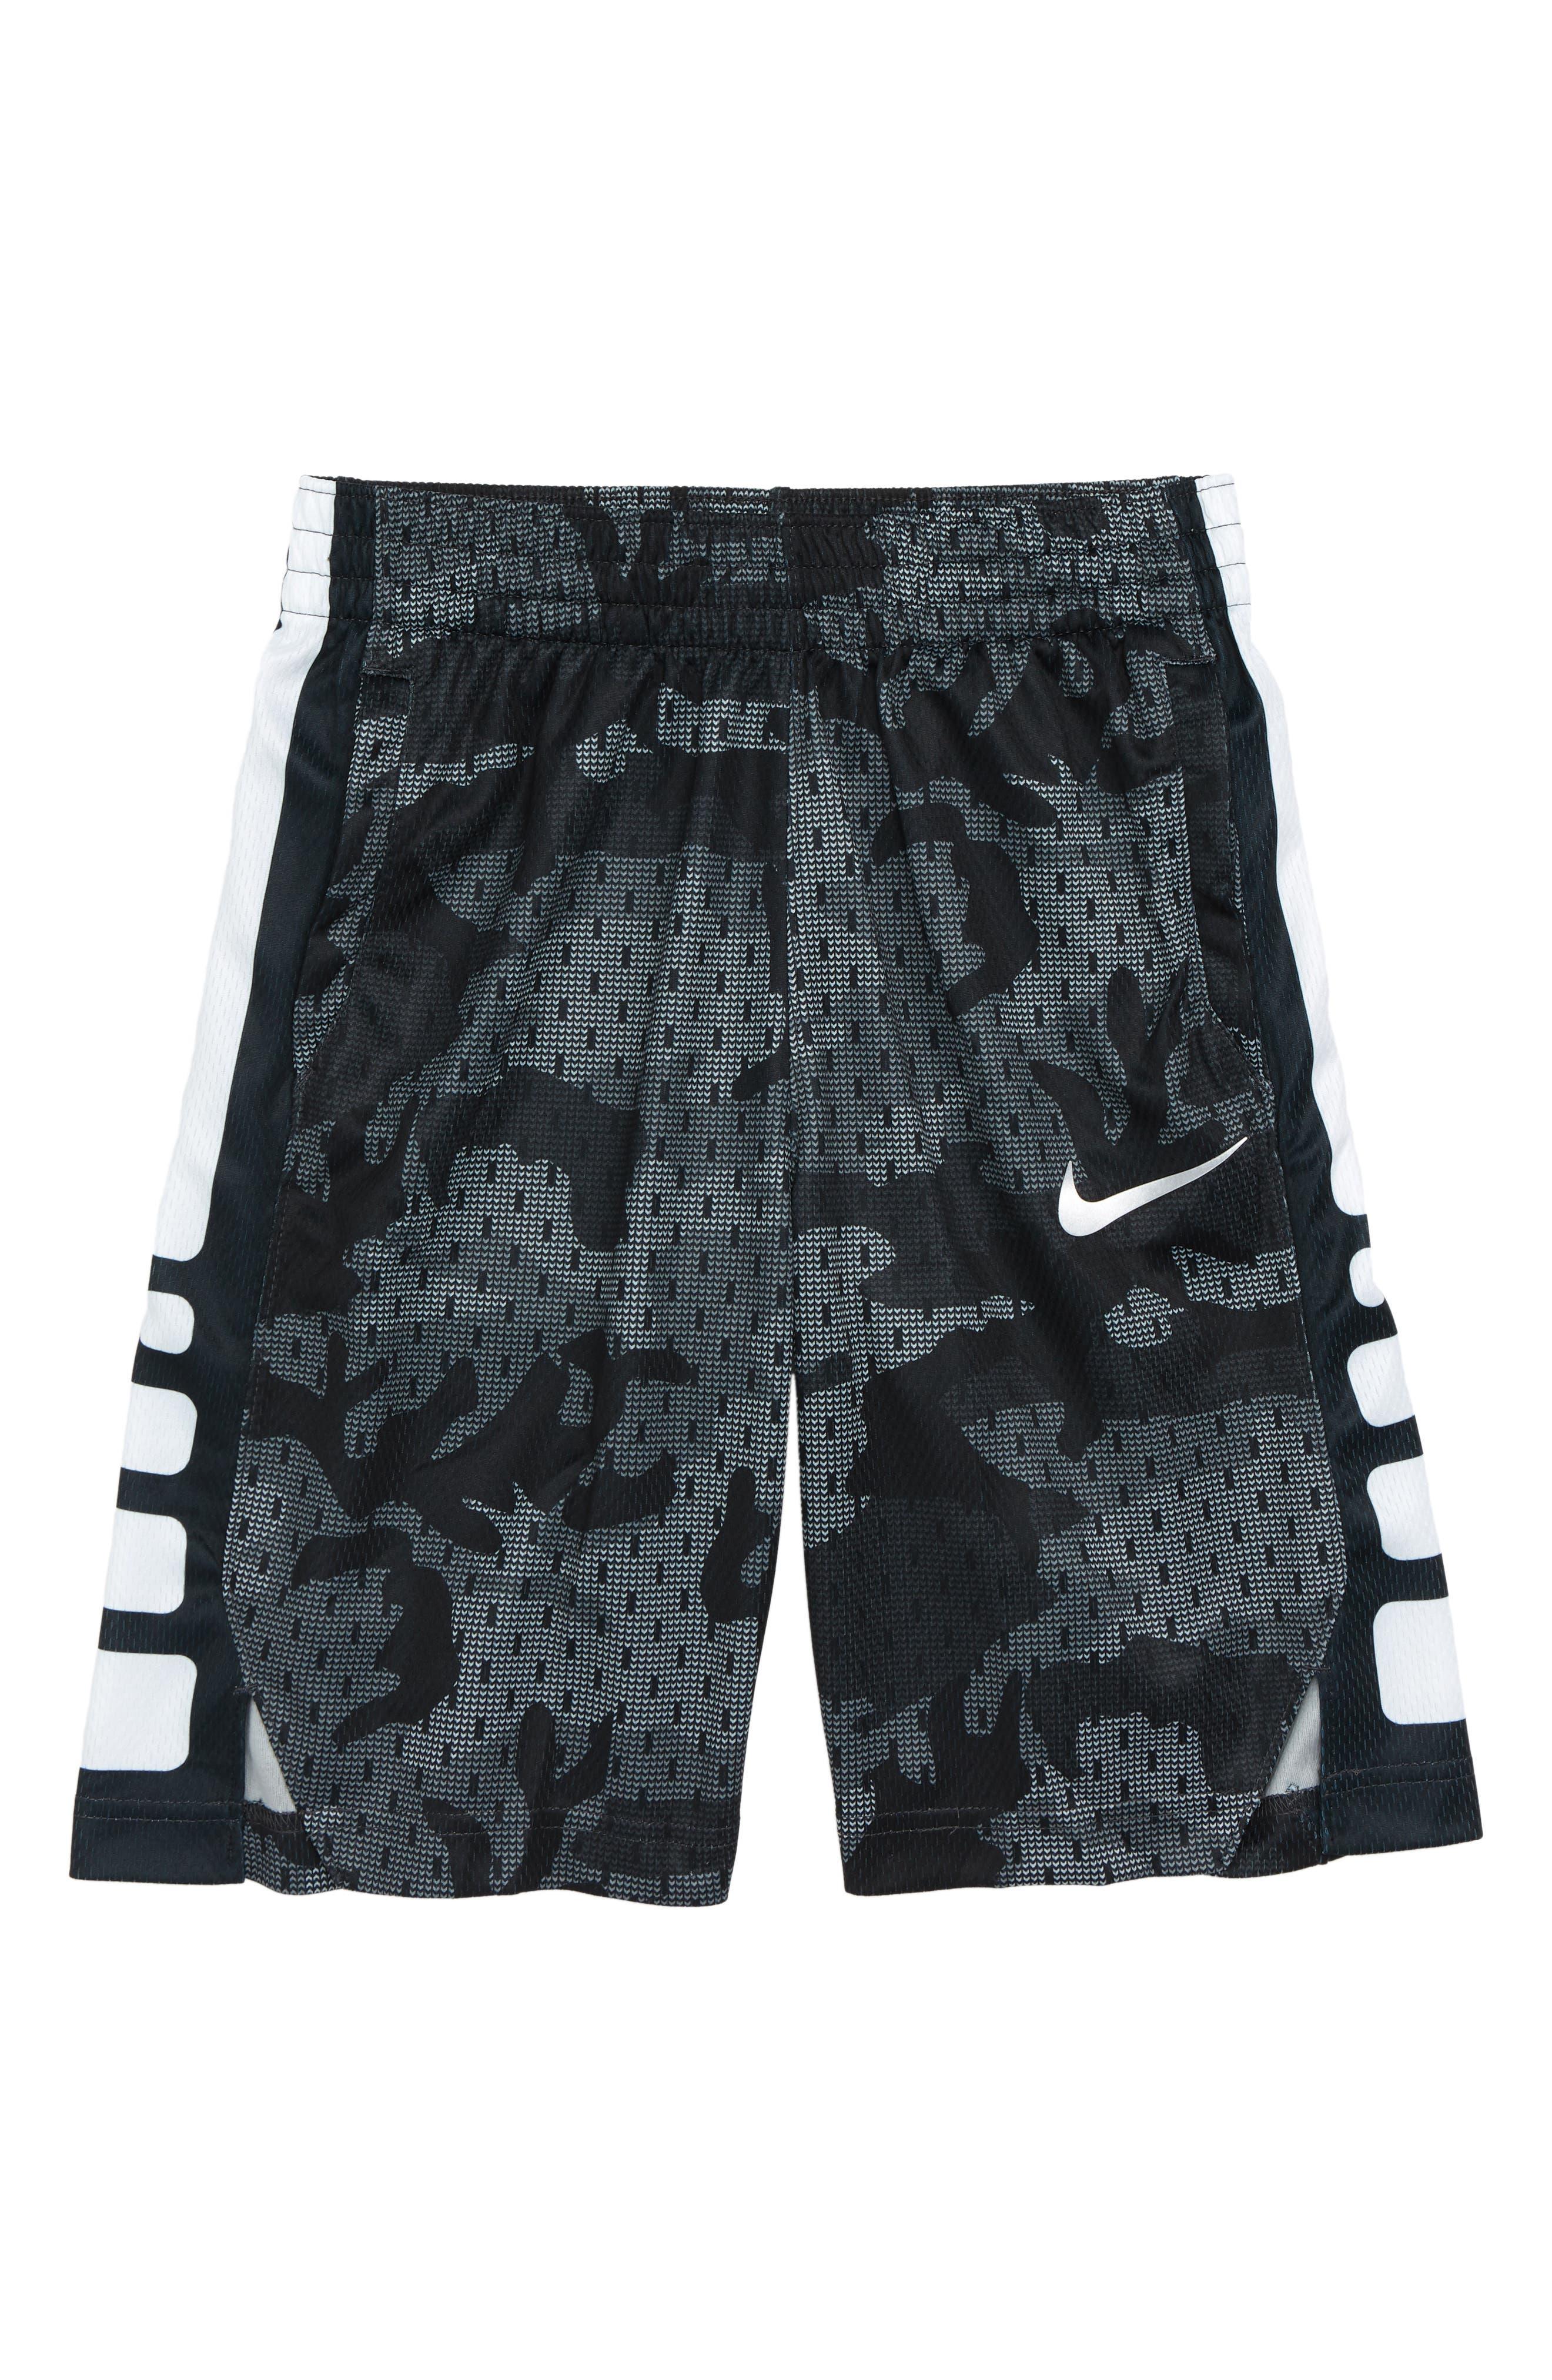 NIKE Dry Elite Basketball Shorts, Main, color, 020